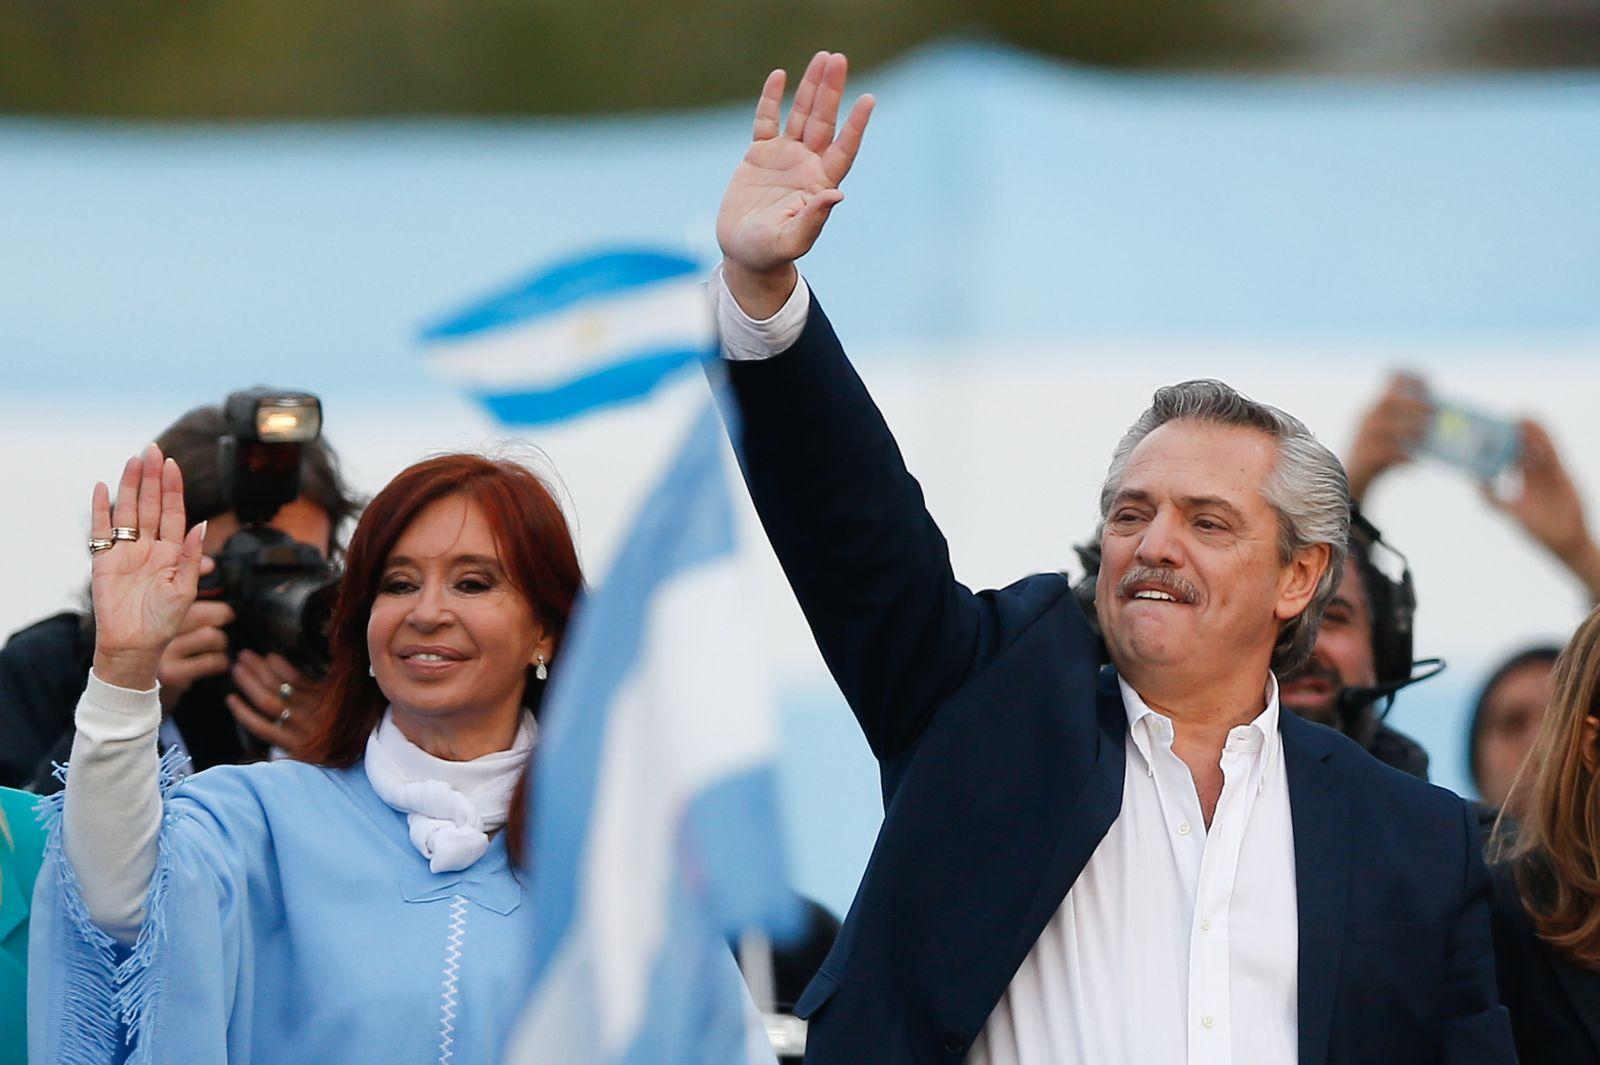 Campaign closure of Alberto Fernandez in Mar del Plata, Argentina - 24 Oct 2019